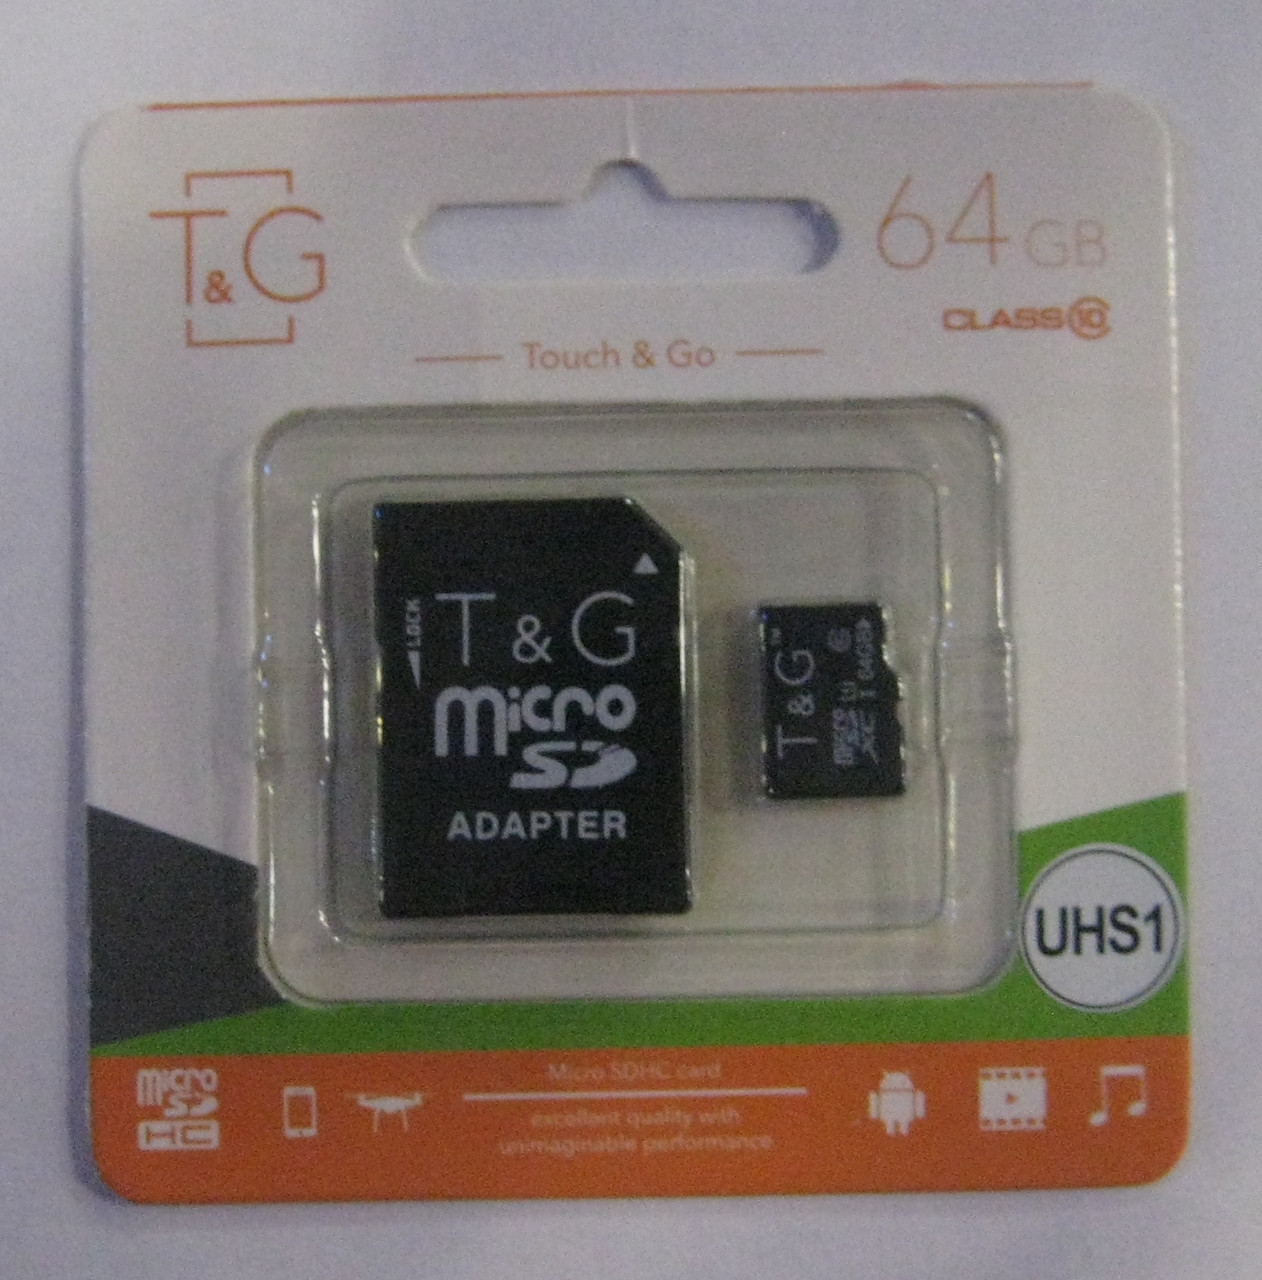 Карта памяти microSD T&G 64GB 10 class (SD adapter)